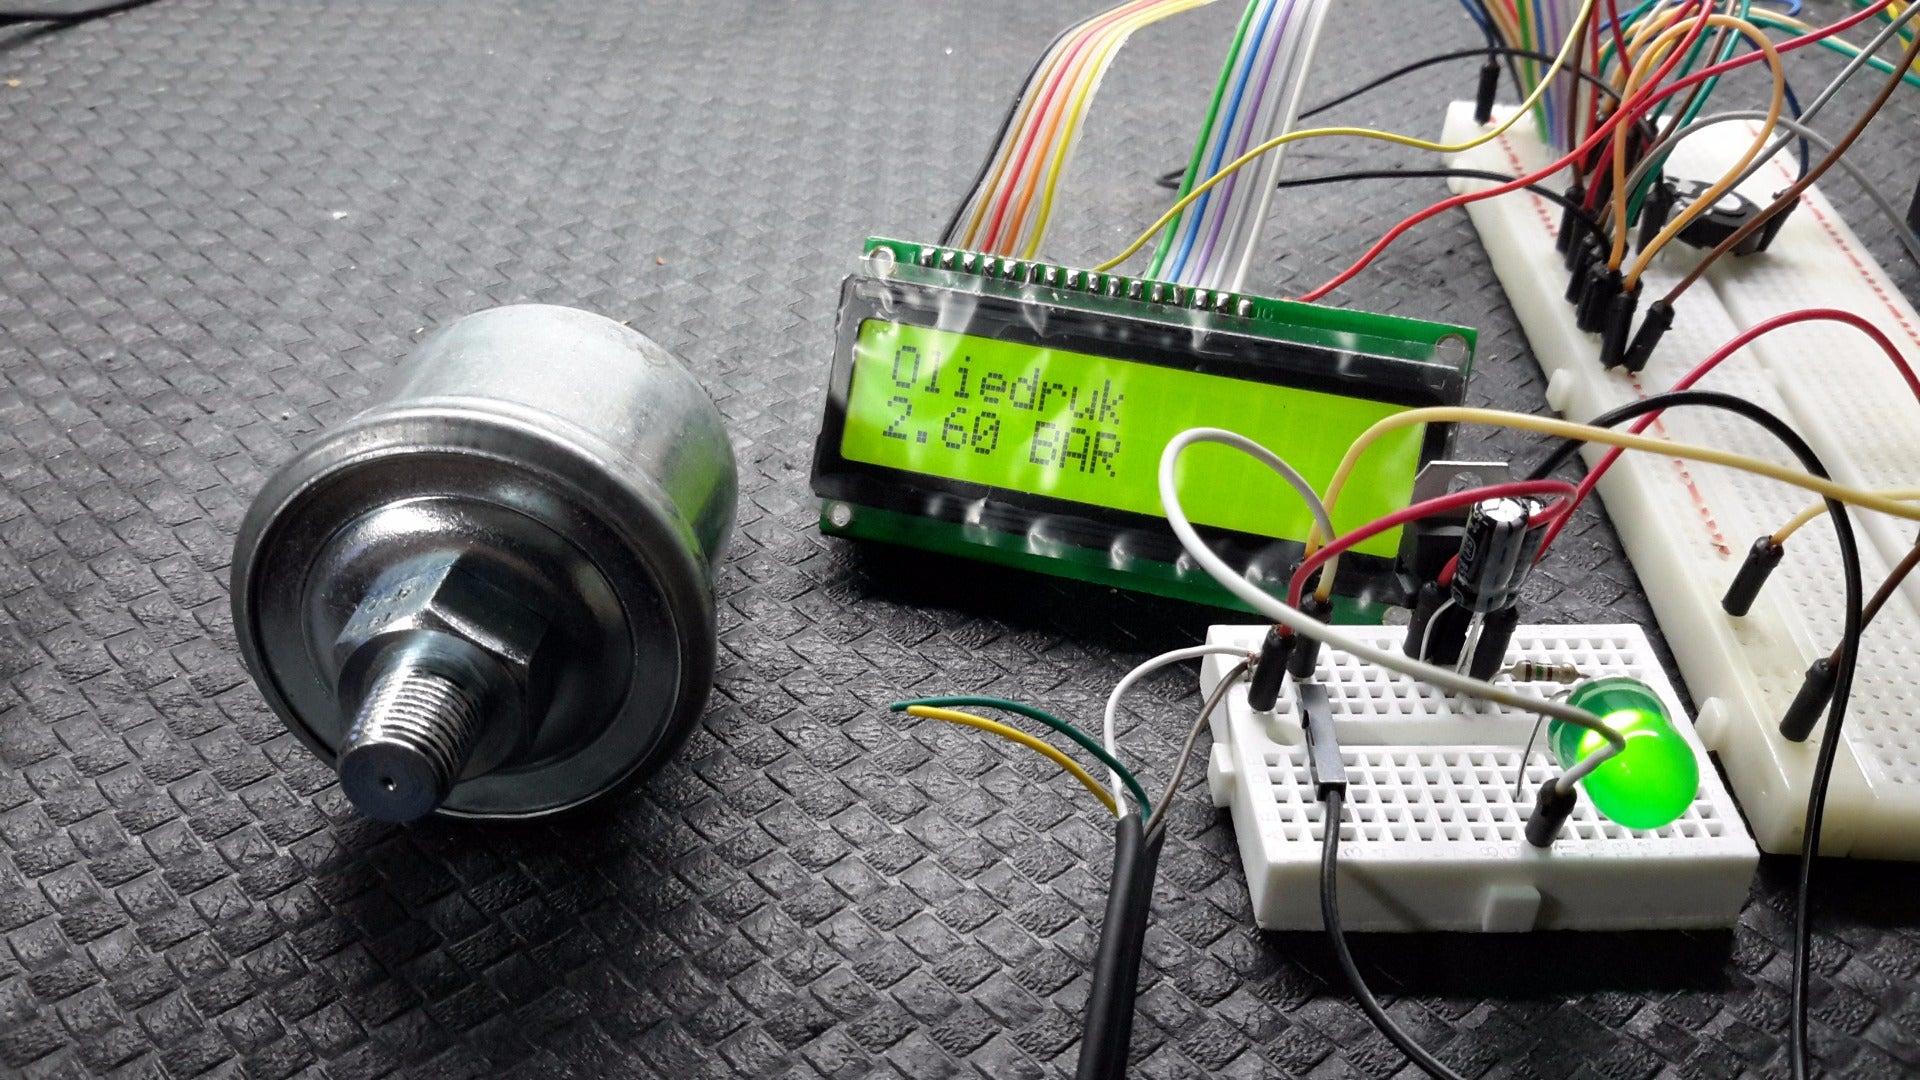 Vdo Oilpressure Sensor For Arduino 8 Steps Gauge Wiring Diagram Boat